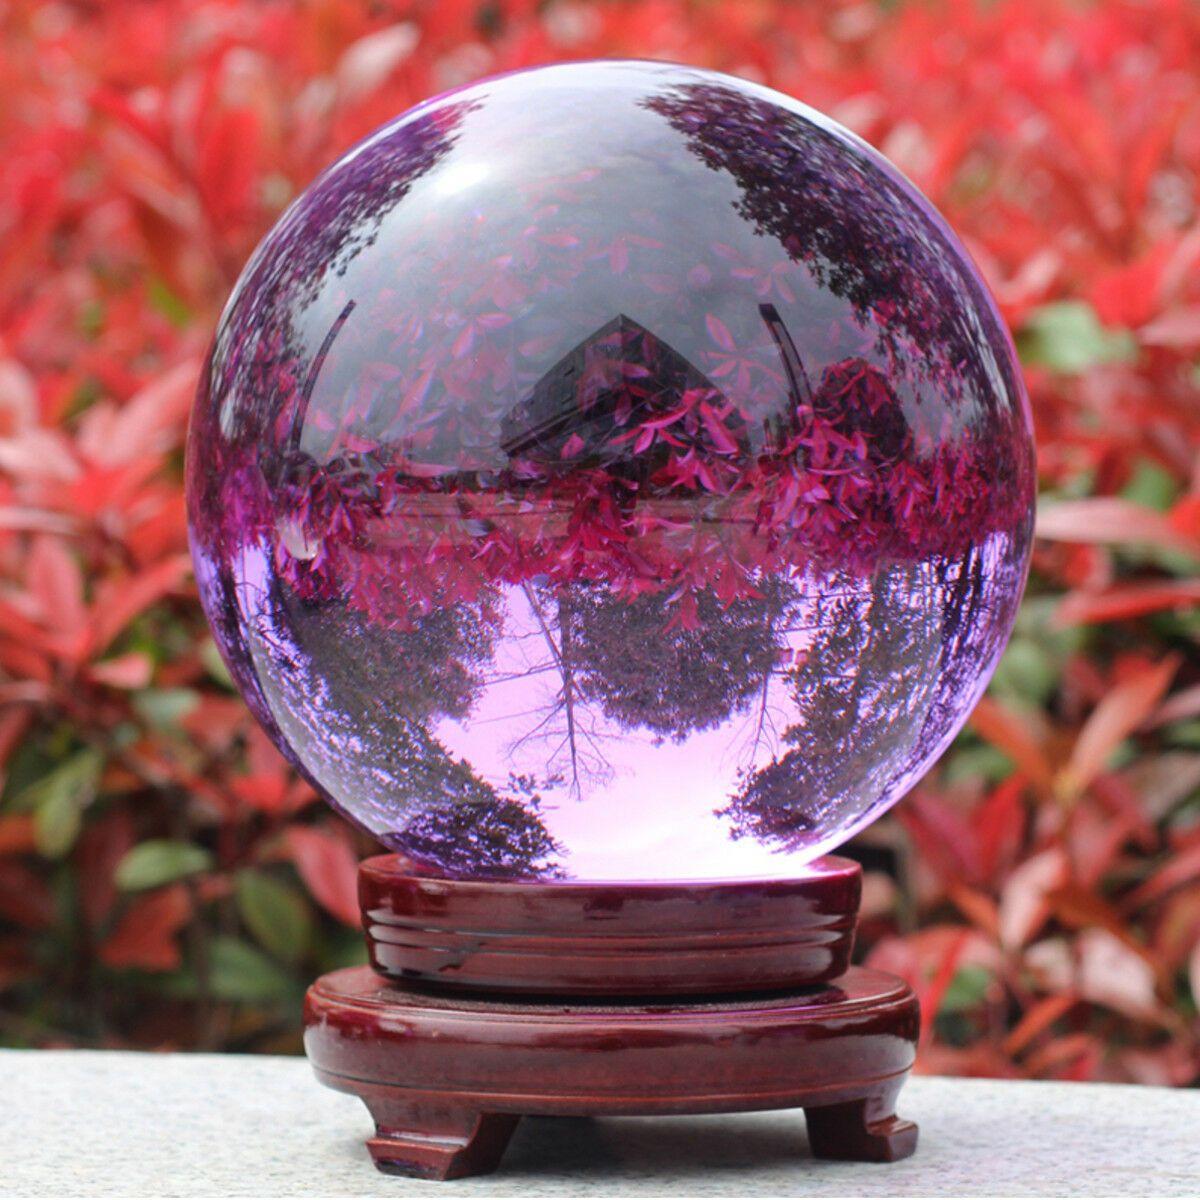 Stand Natural Amethyst Quartz Crystal Sphere Ball Healing Stone 30-60mm